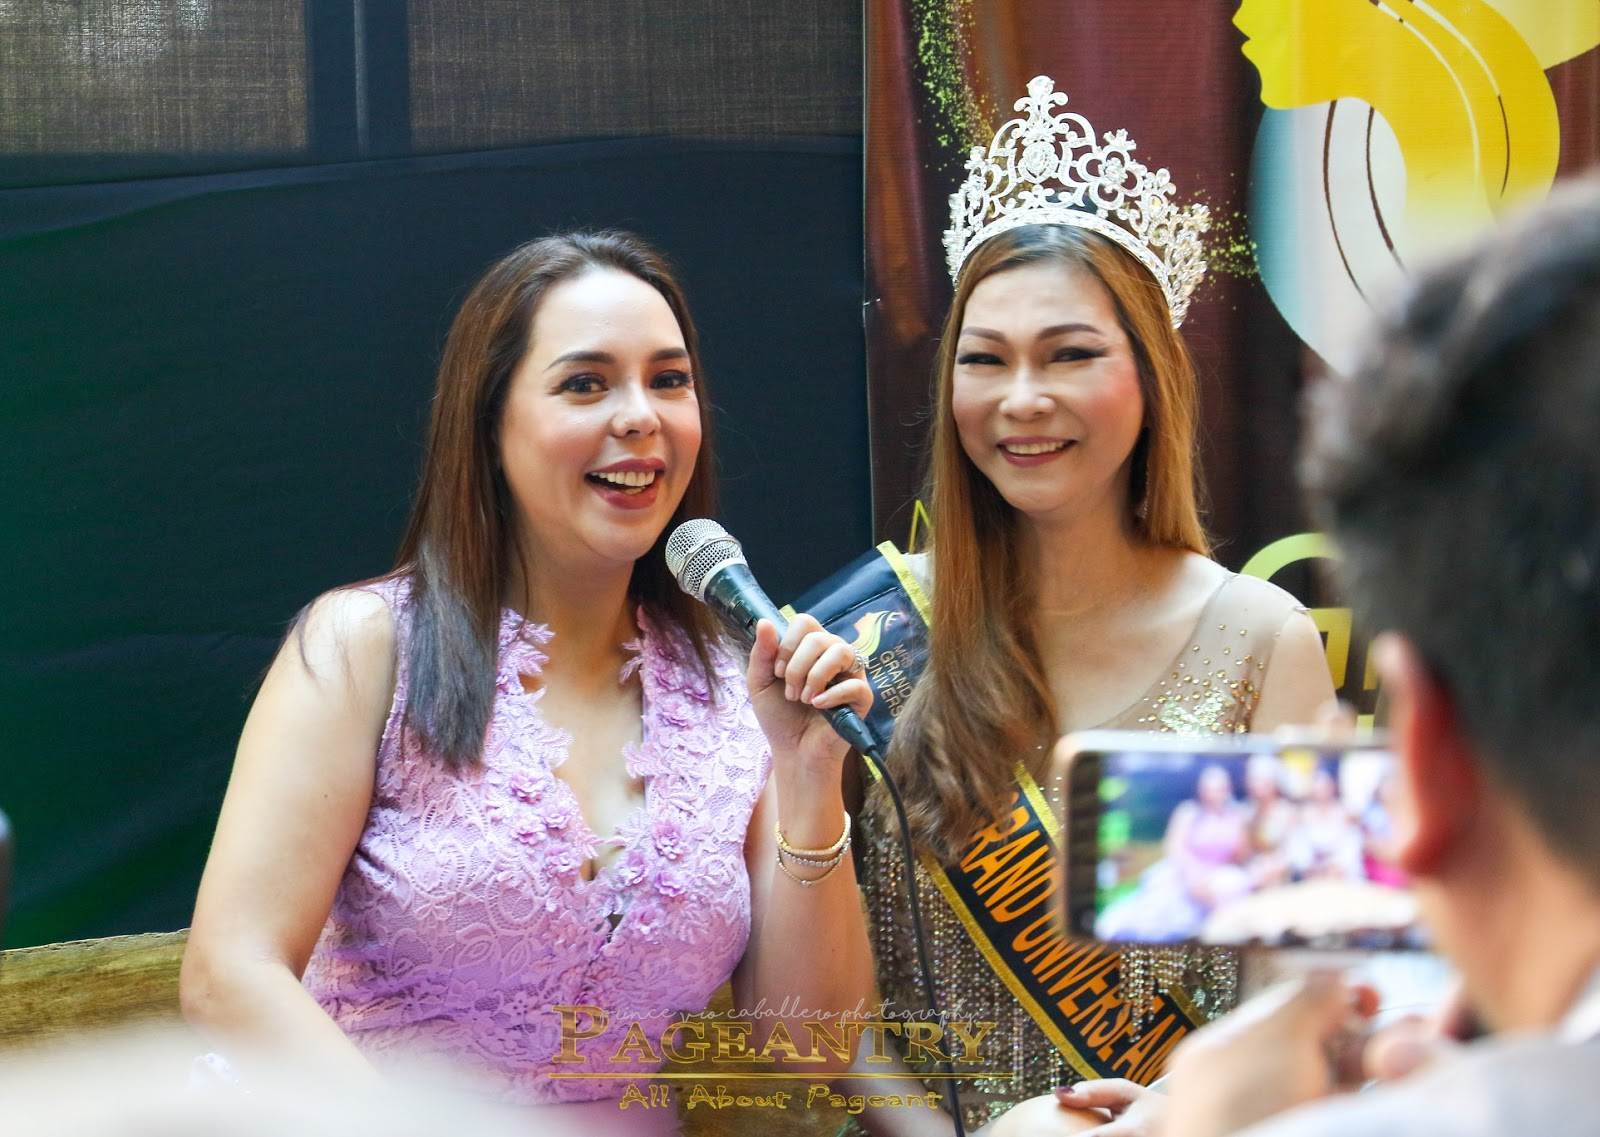 Alma Concepcion pageantry magazine: ms & mrs grand universe press launch